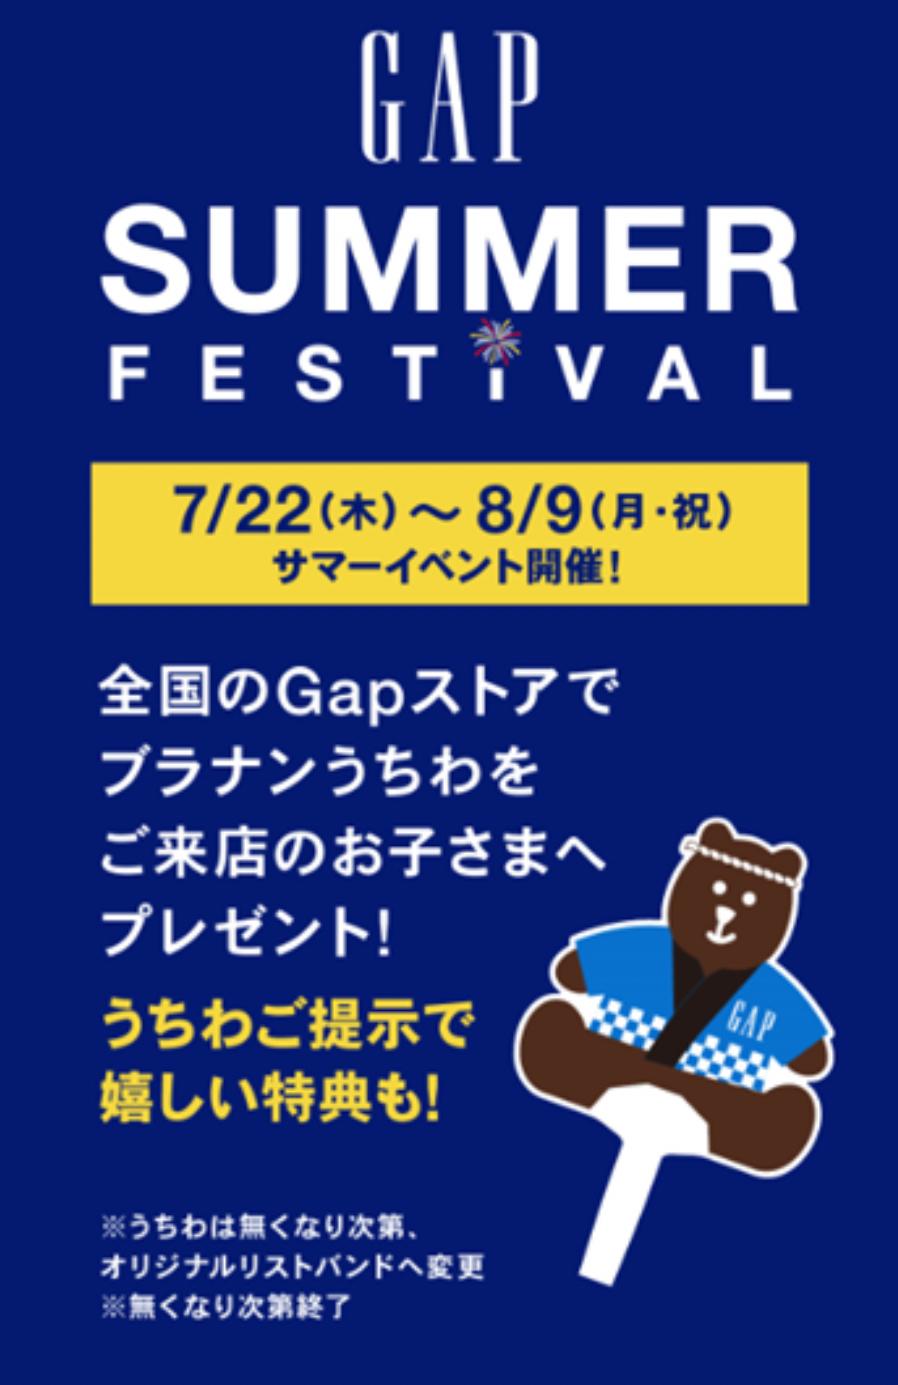 【GAP/GAPKids】SUMMER FESTIVAL 開催‼︎